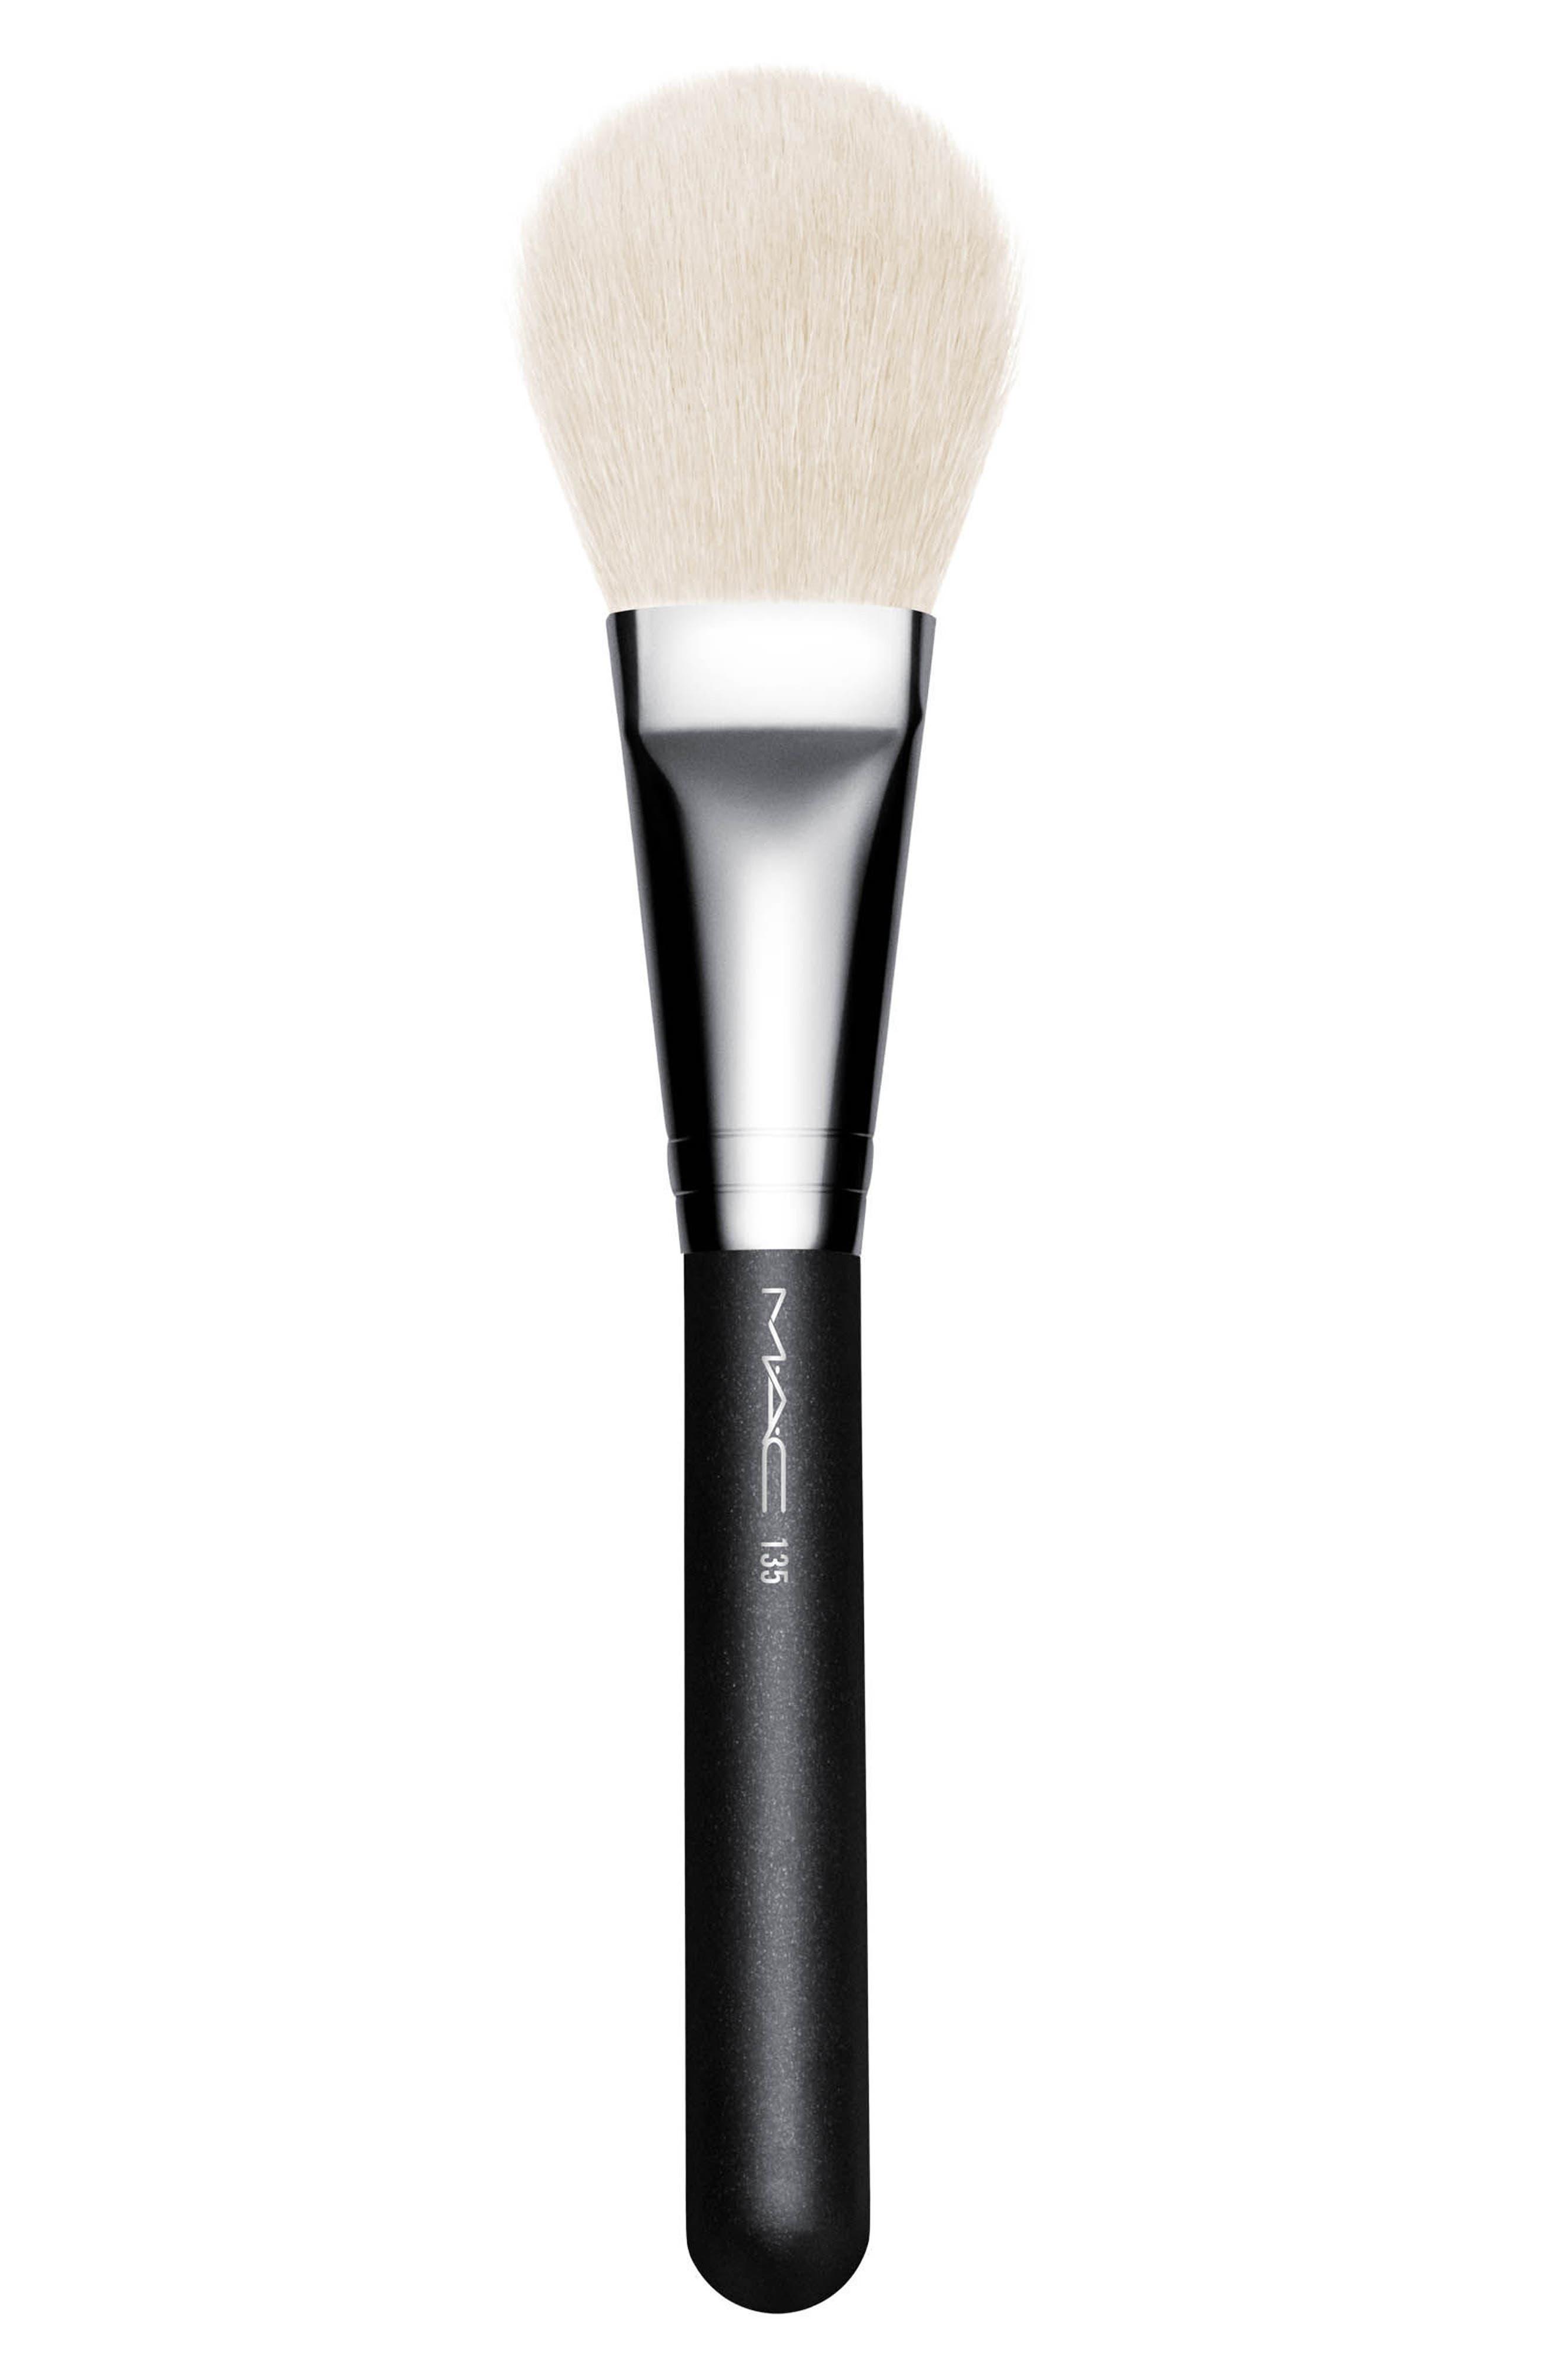 MAC 135 Large Flat Powder Brush,                             Main thumbnail 1, color,                             000